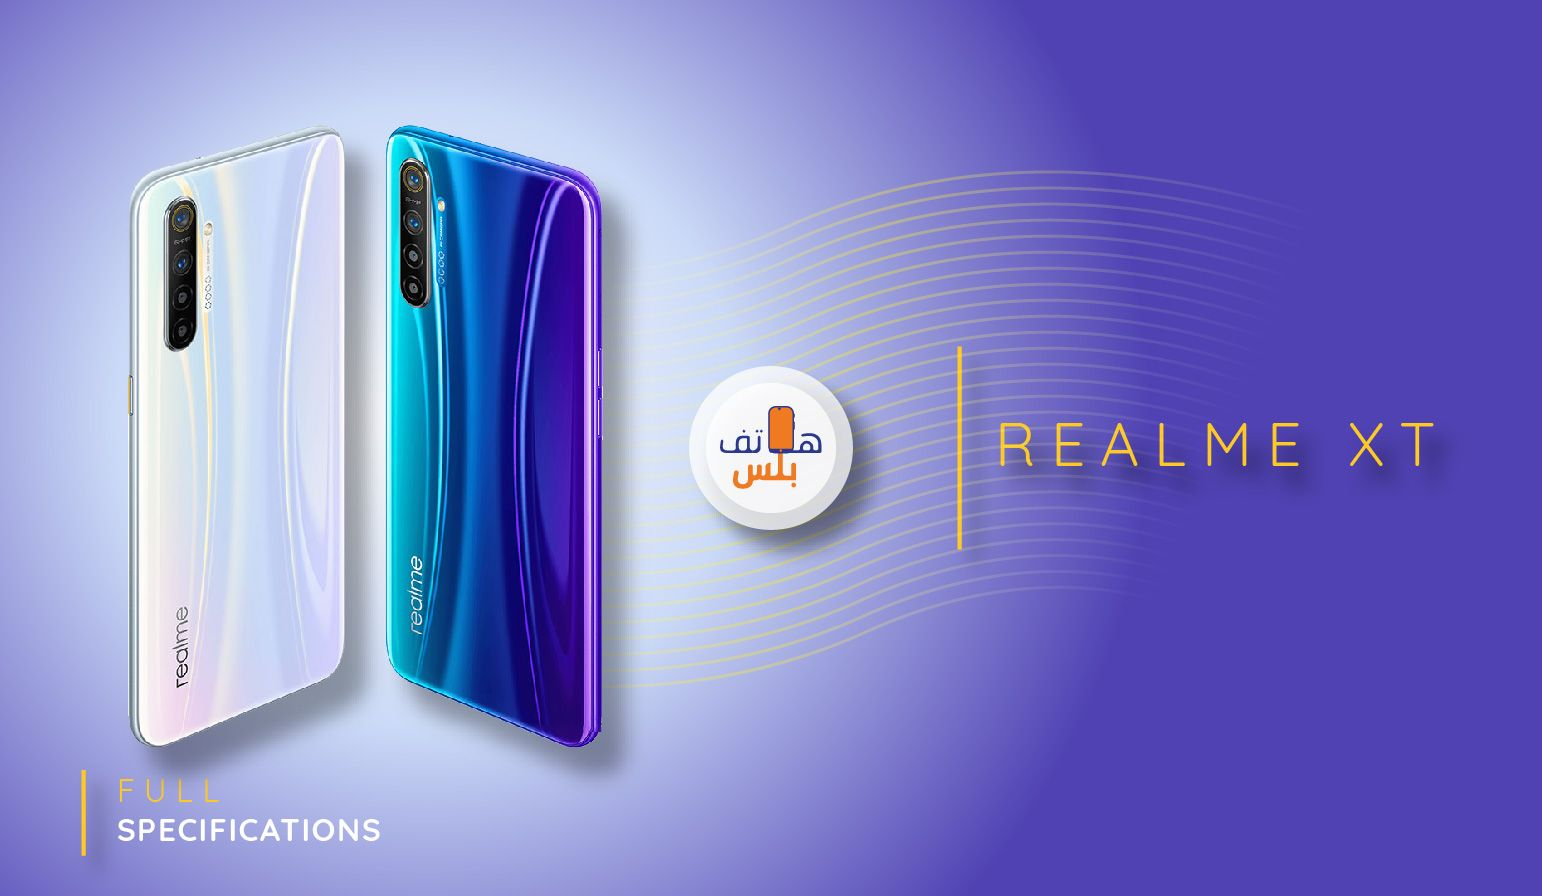 تعرف على مواصفات هاتف Realme Xt المتوقع نزوله مصر قريبا هاتف بلس